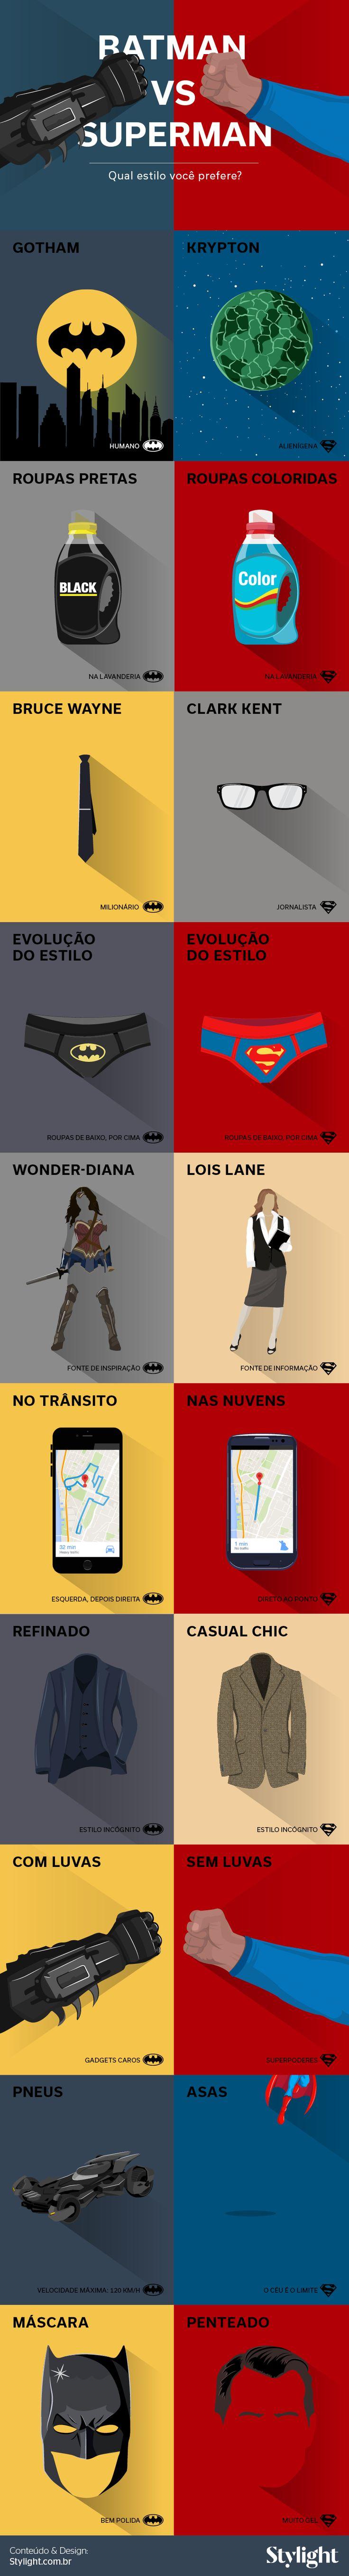 Batman vs Superman - Qual estilo você prefere? | Stylight